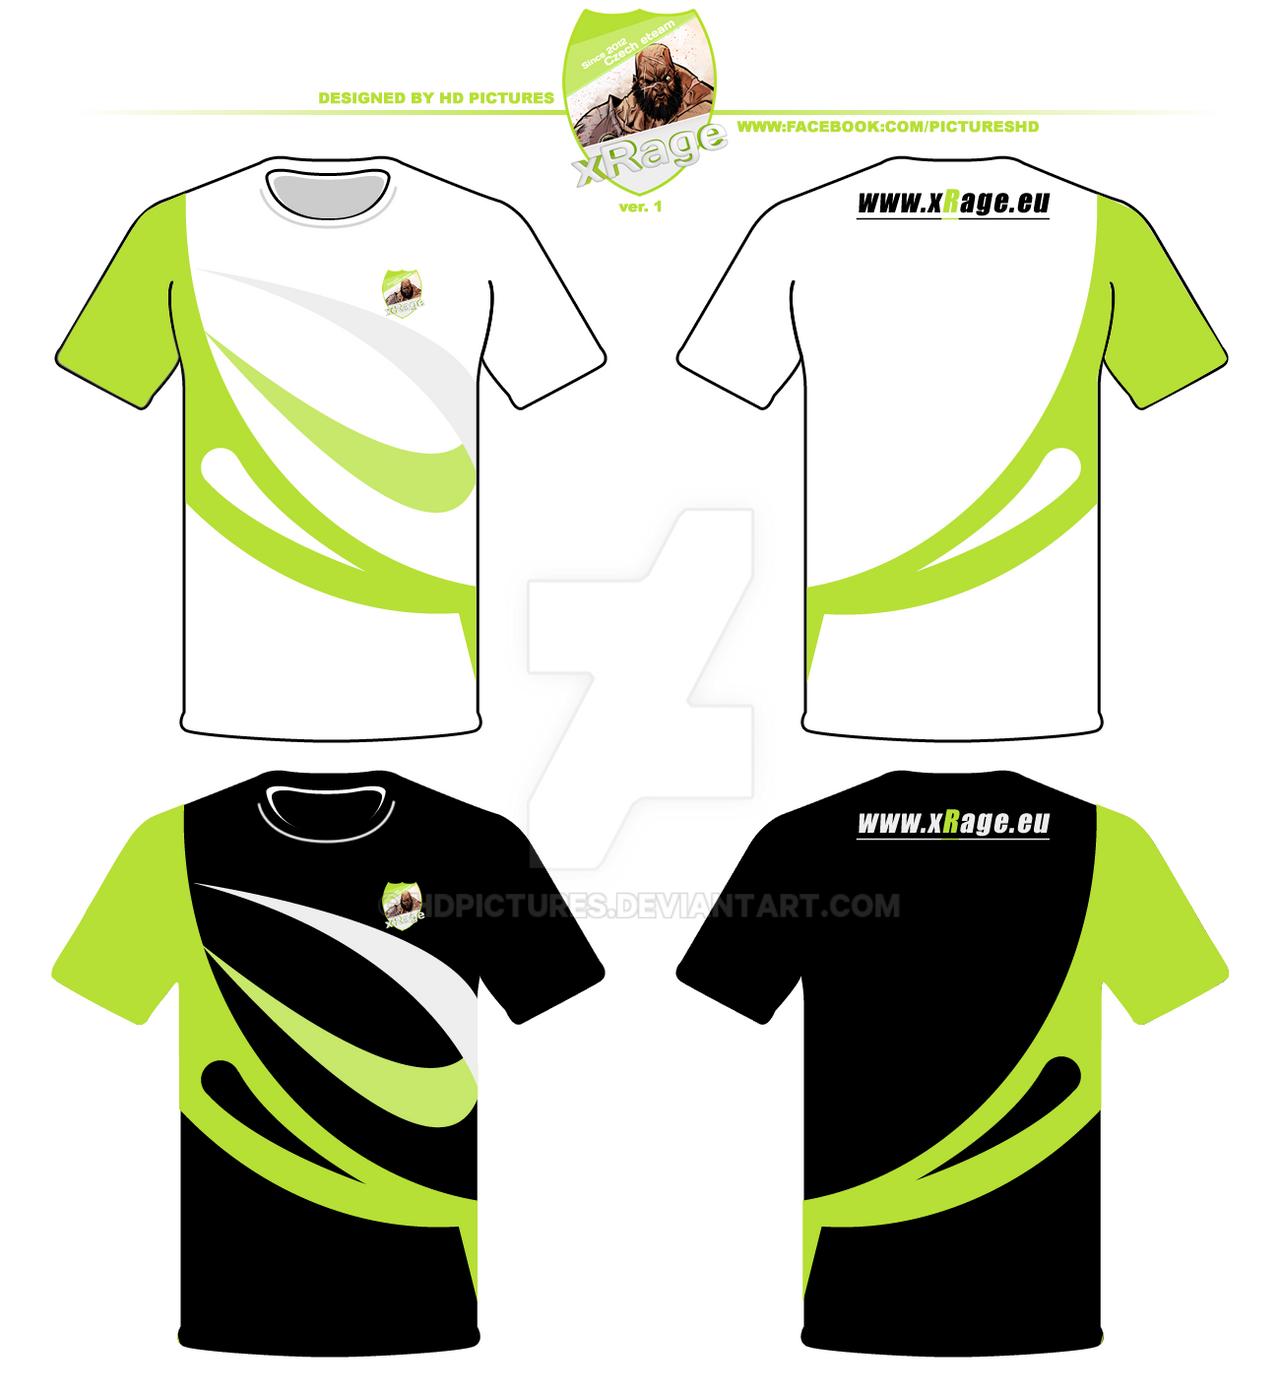 design team t shirts x rageeu ver1 by hdpictures - Team T Shirt Design Ideas